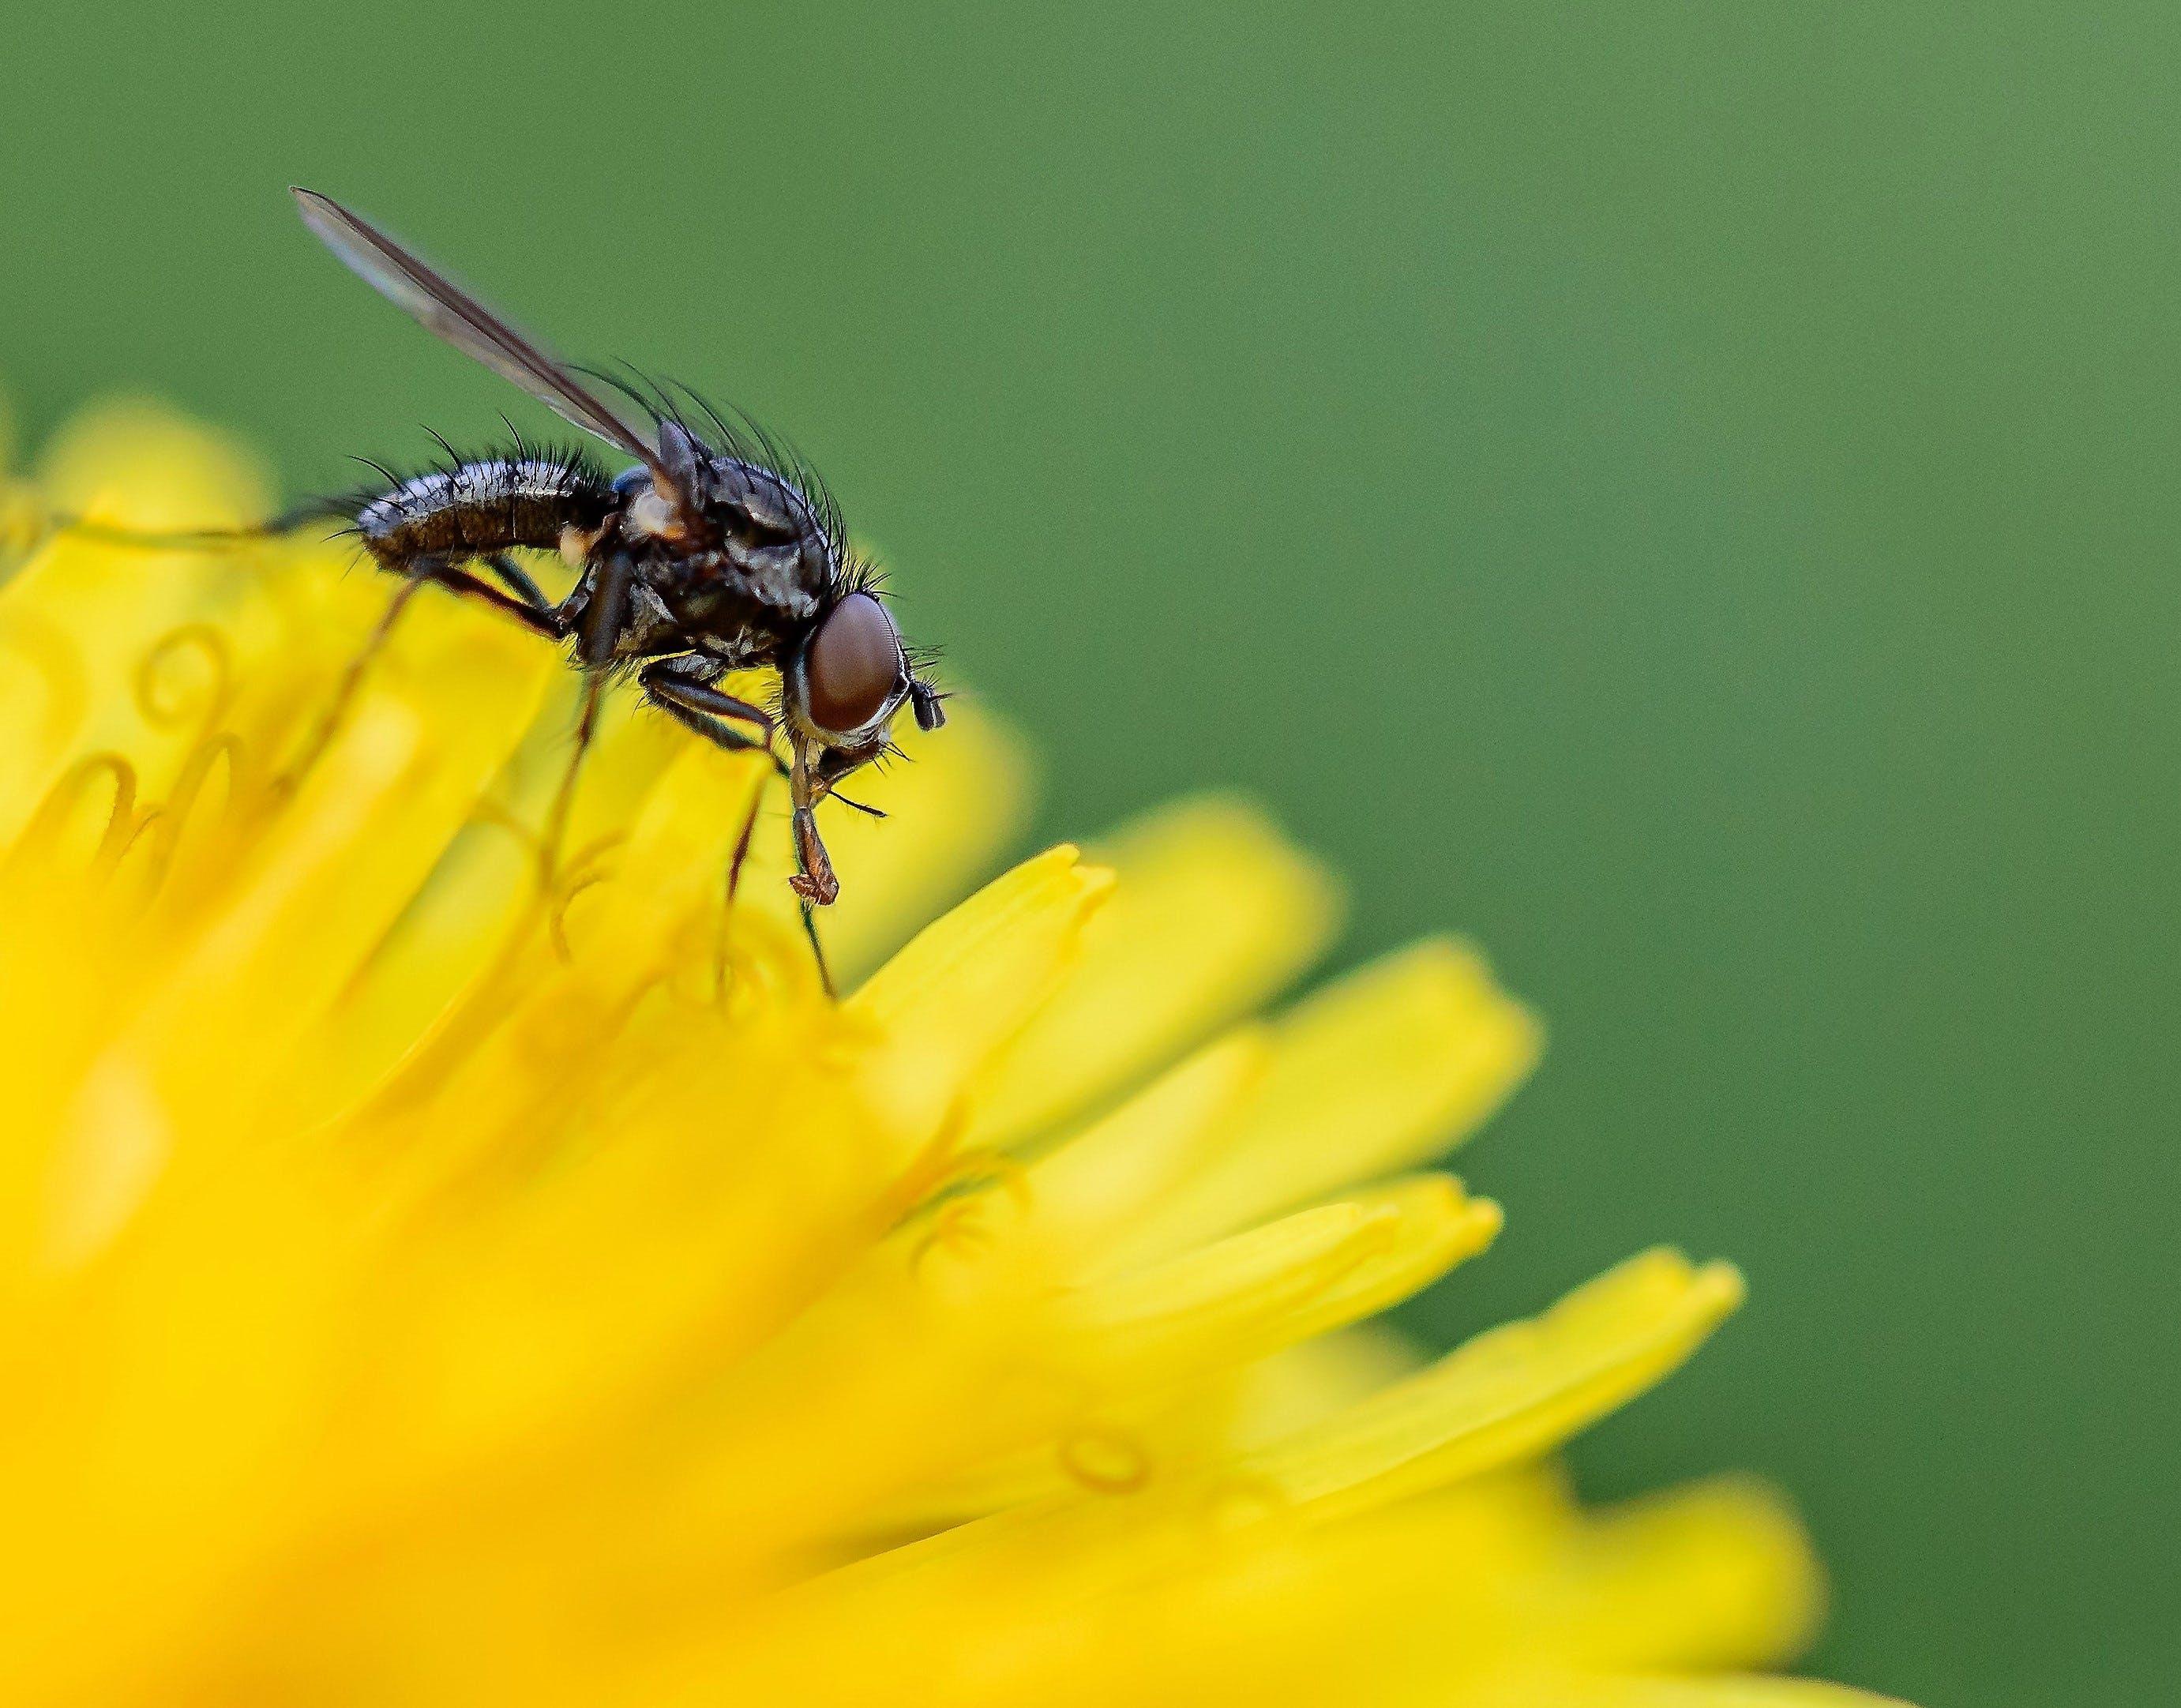 Fly on Yellow Dandelion Flower